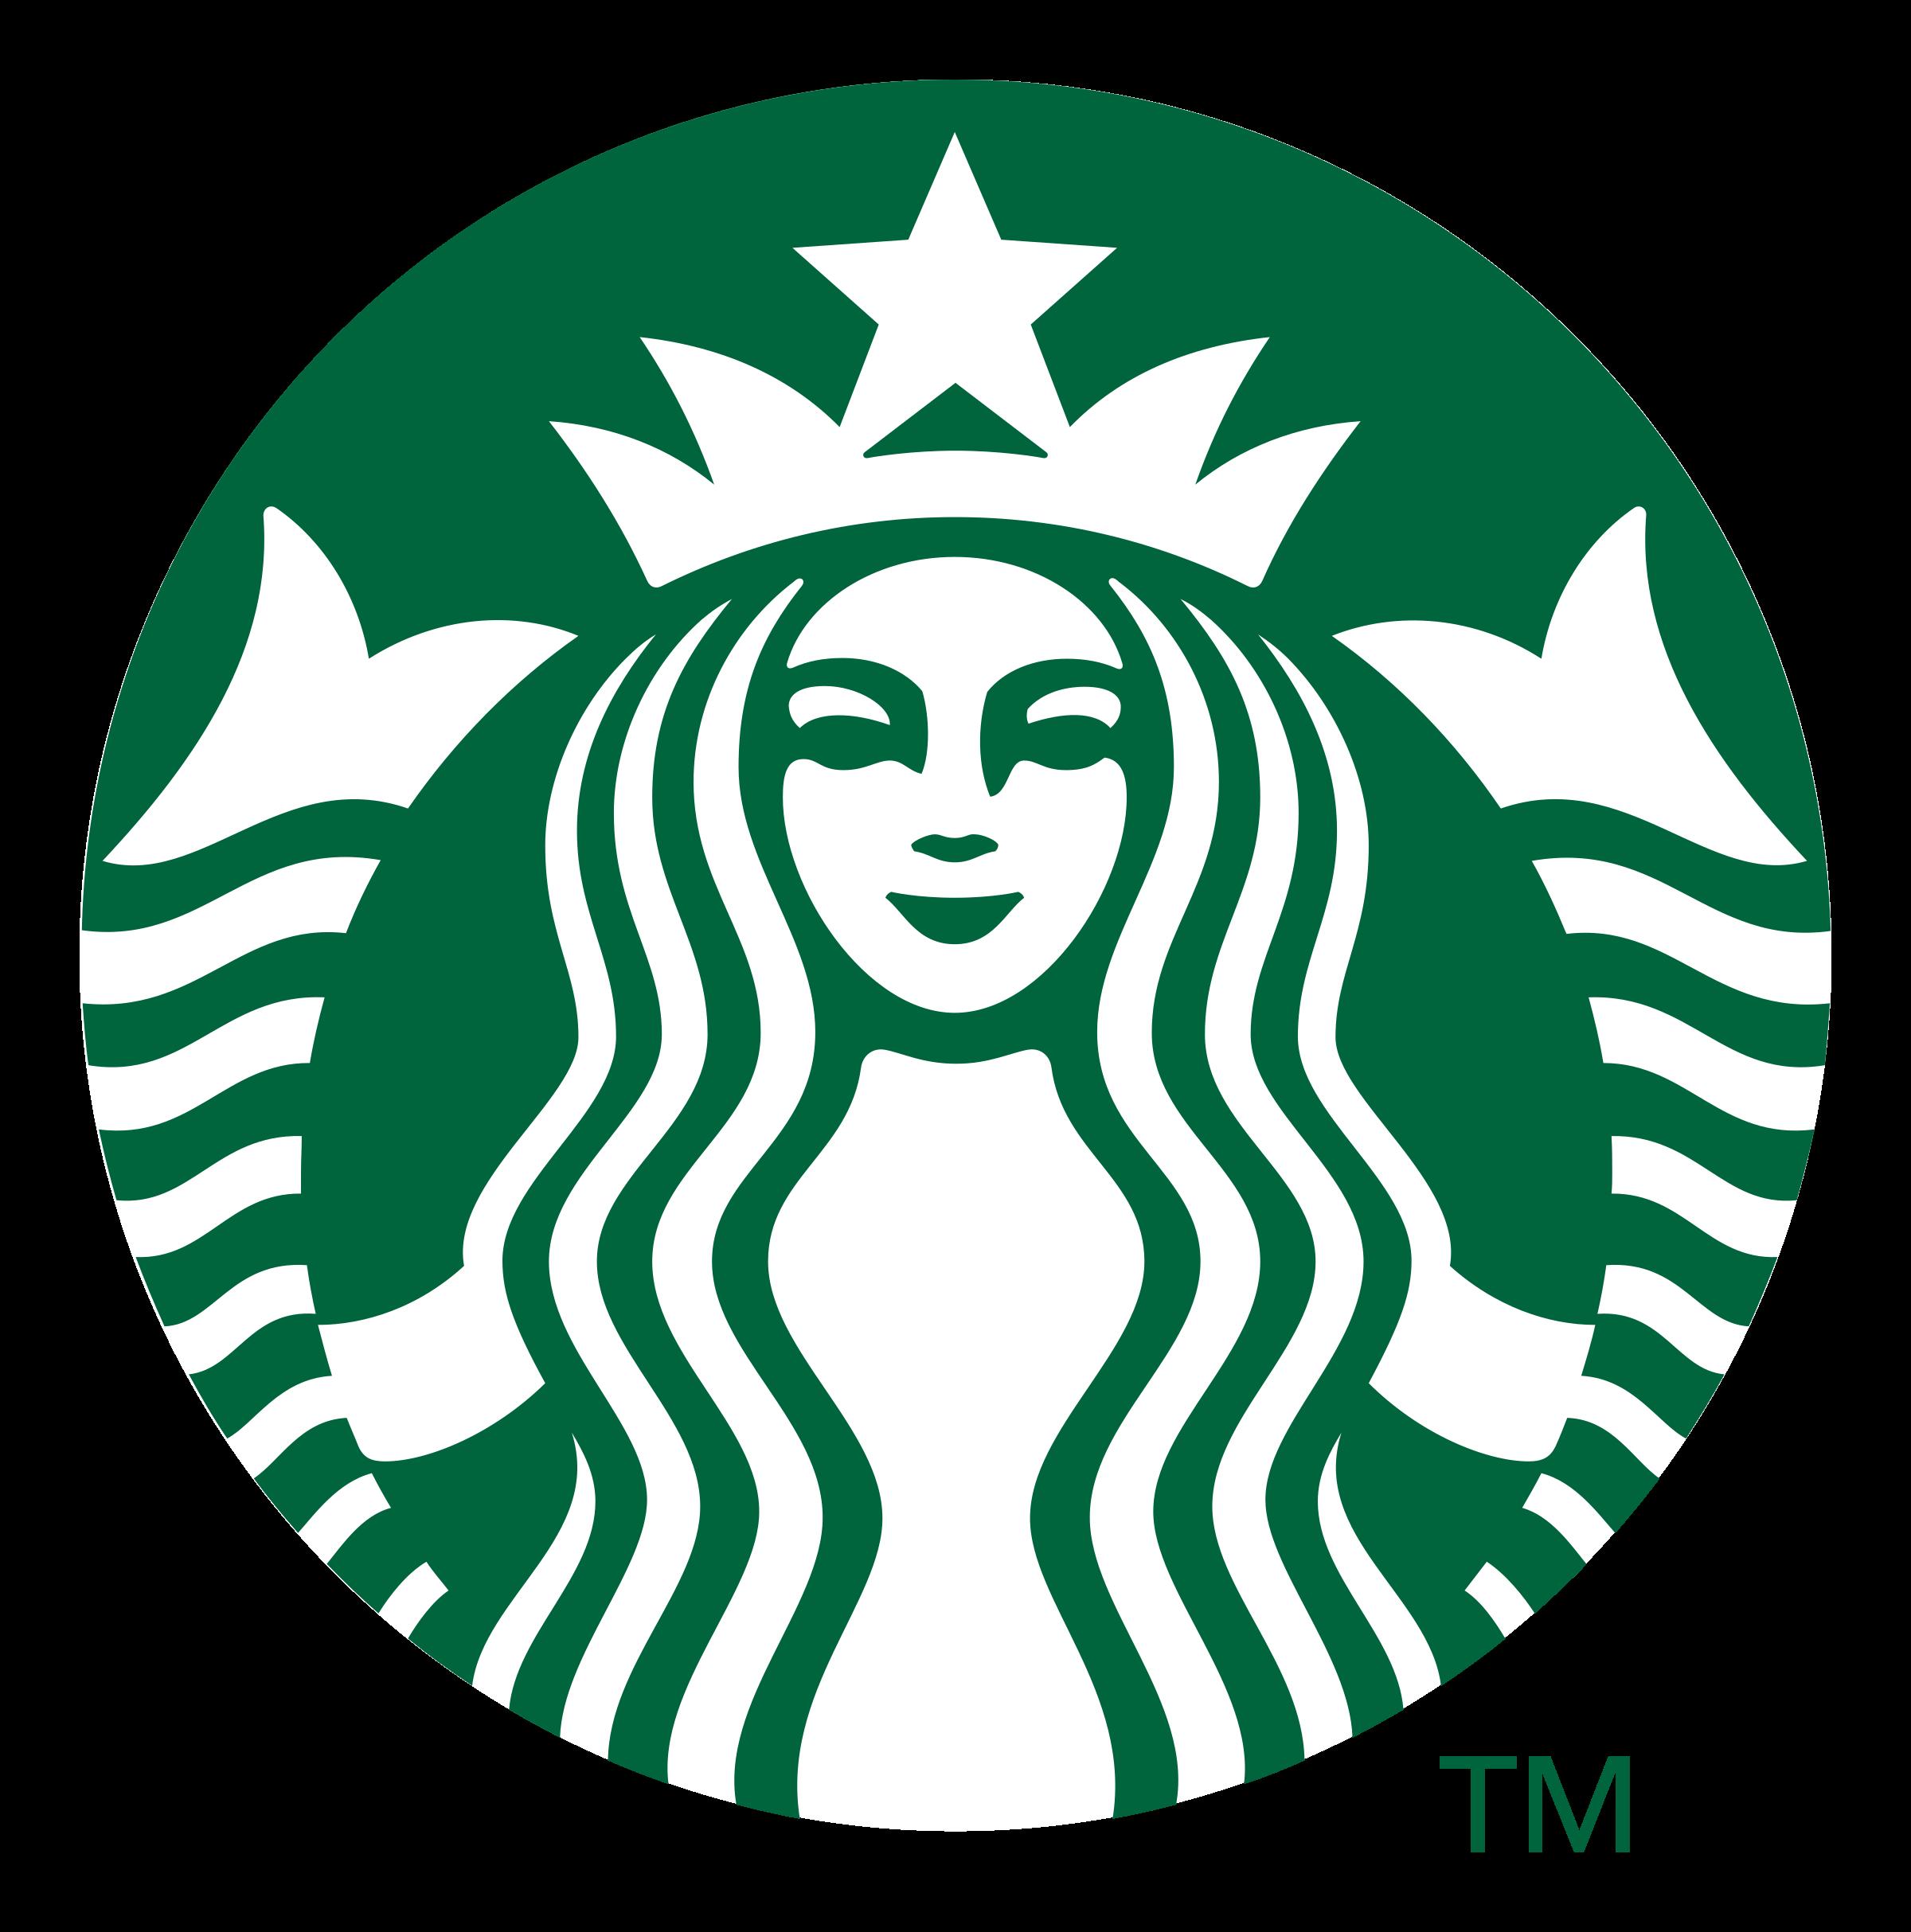 Starbucks Logo PNG Transparent & SVG Vector - Freebie Supply